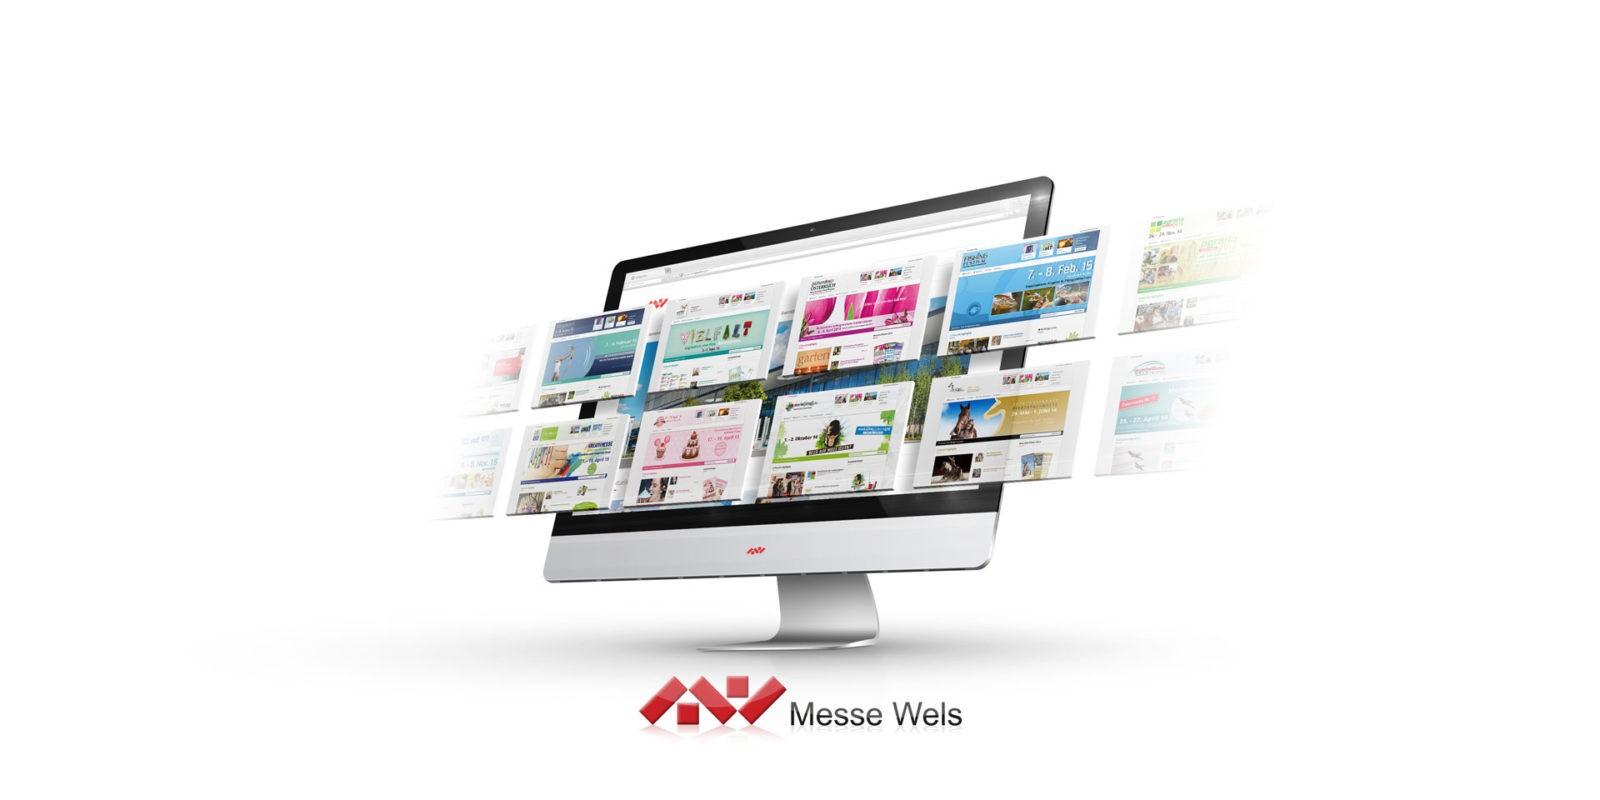 messe wels projekte - Webdesign Messe Wels GmbH